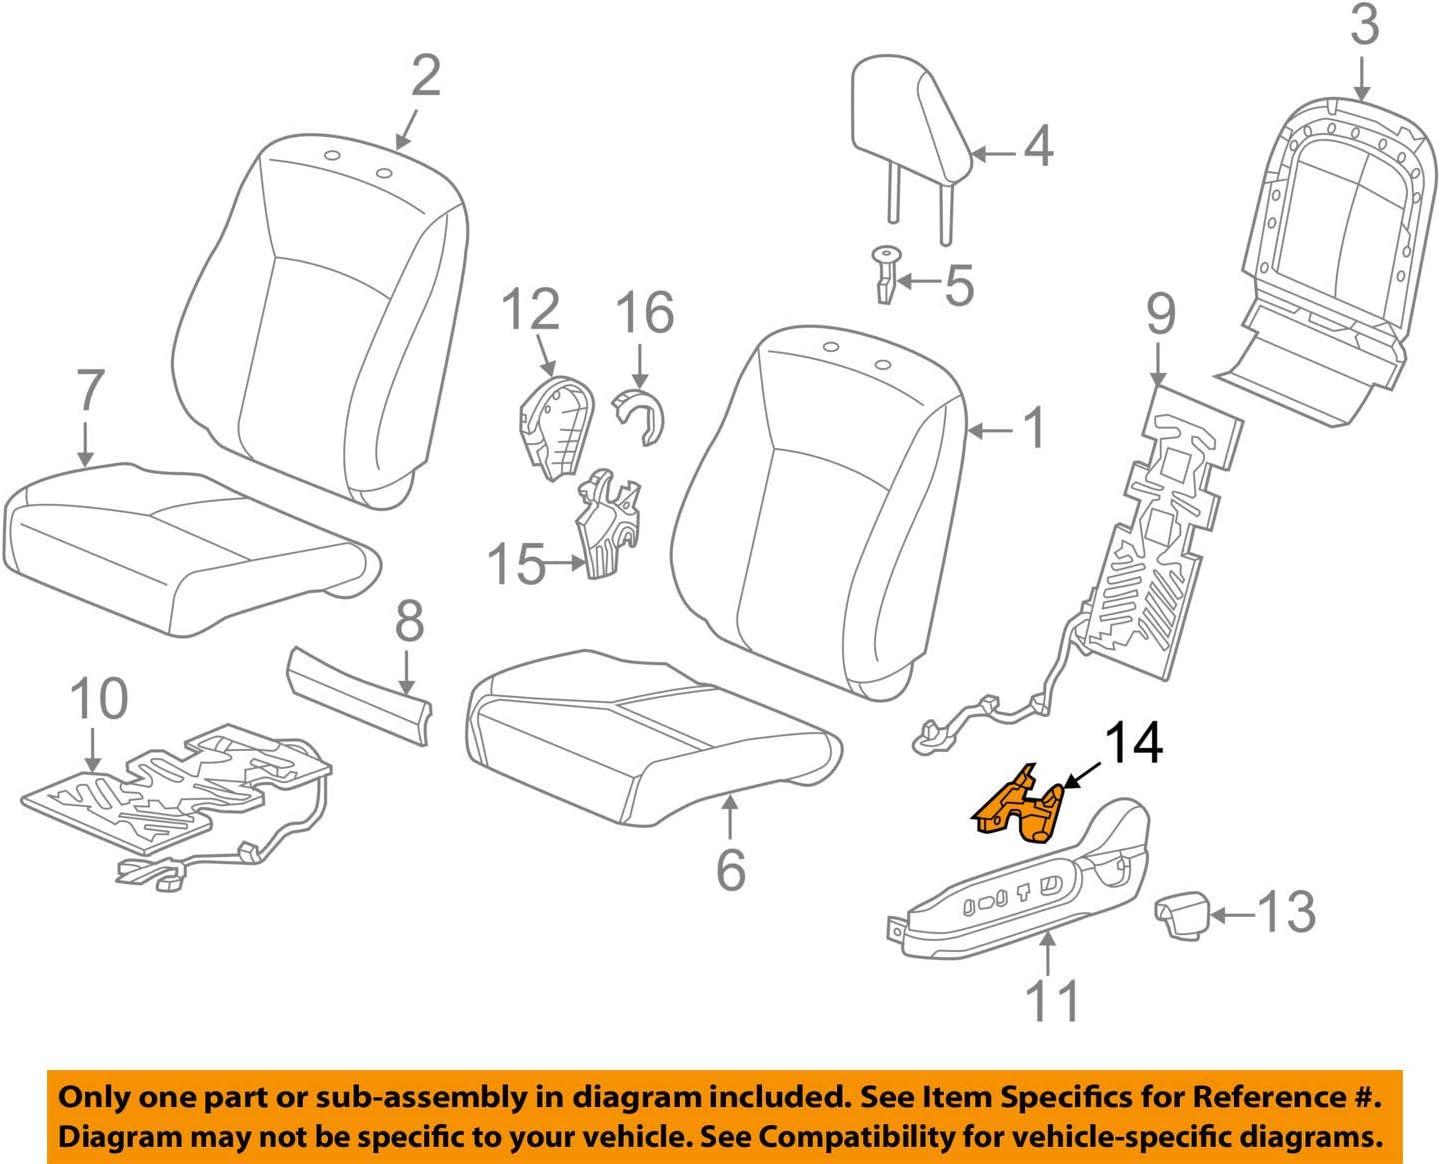 Honda Genuine 81121-S5D-A61ZA Seat Back Trim Cover Right Front